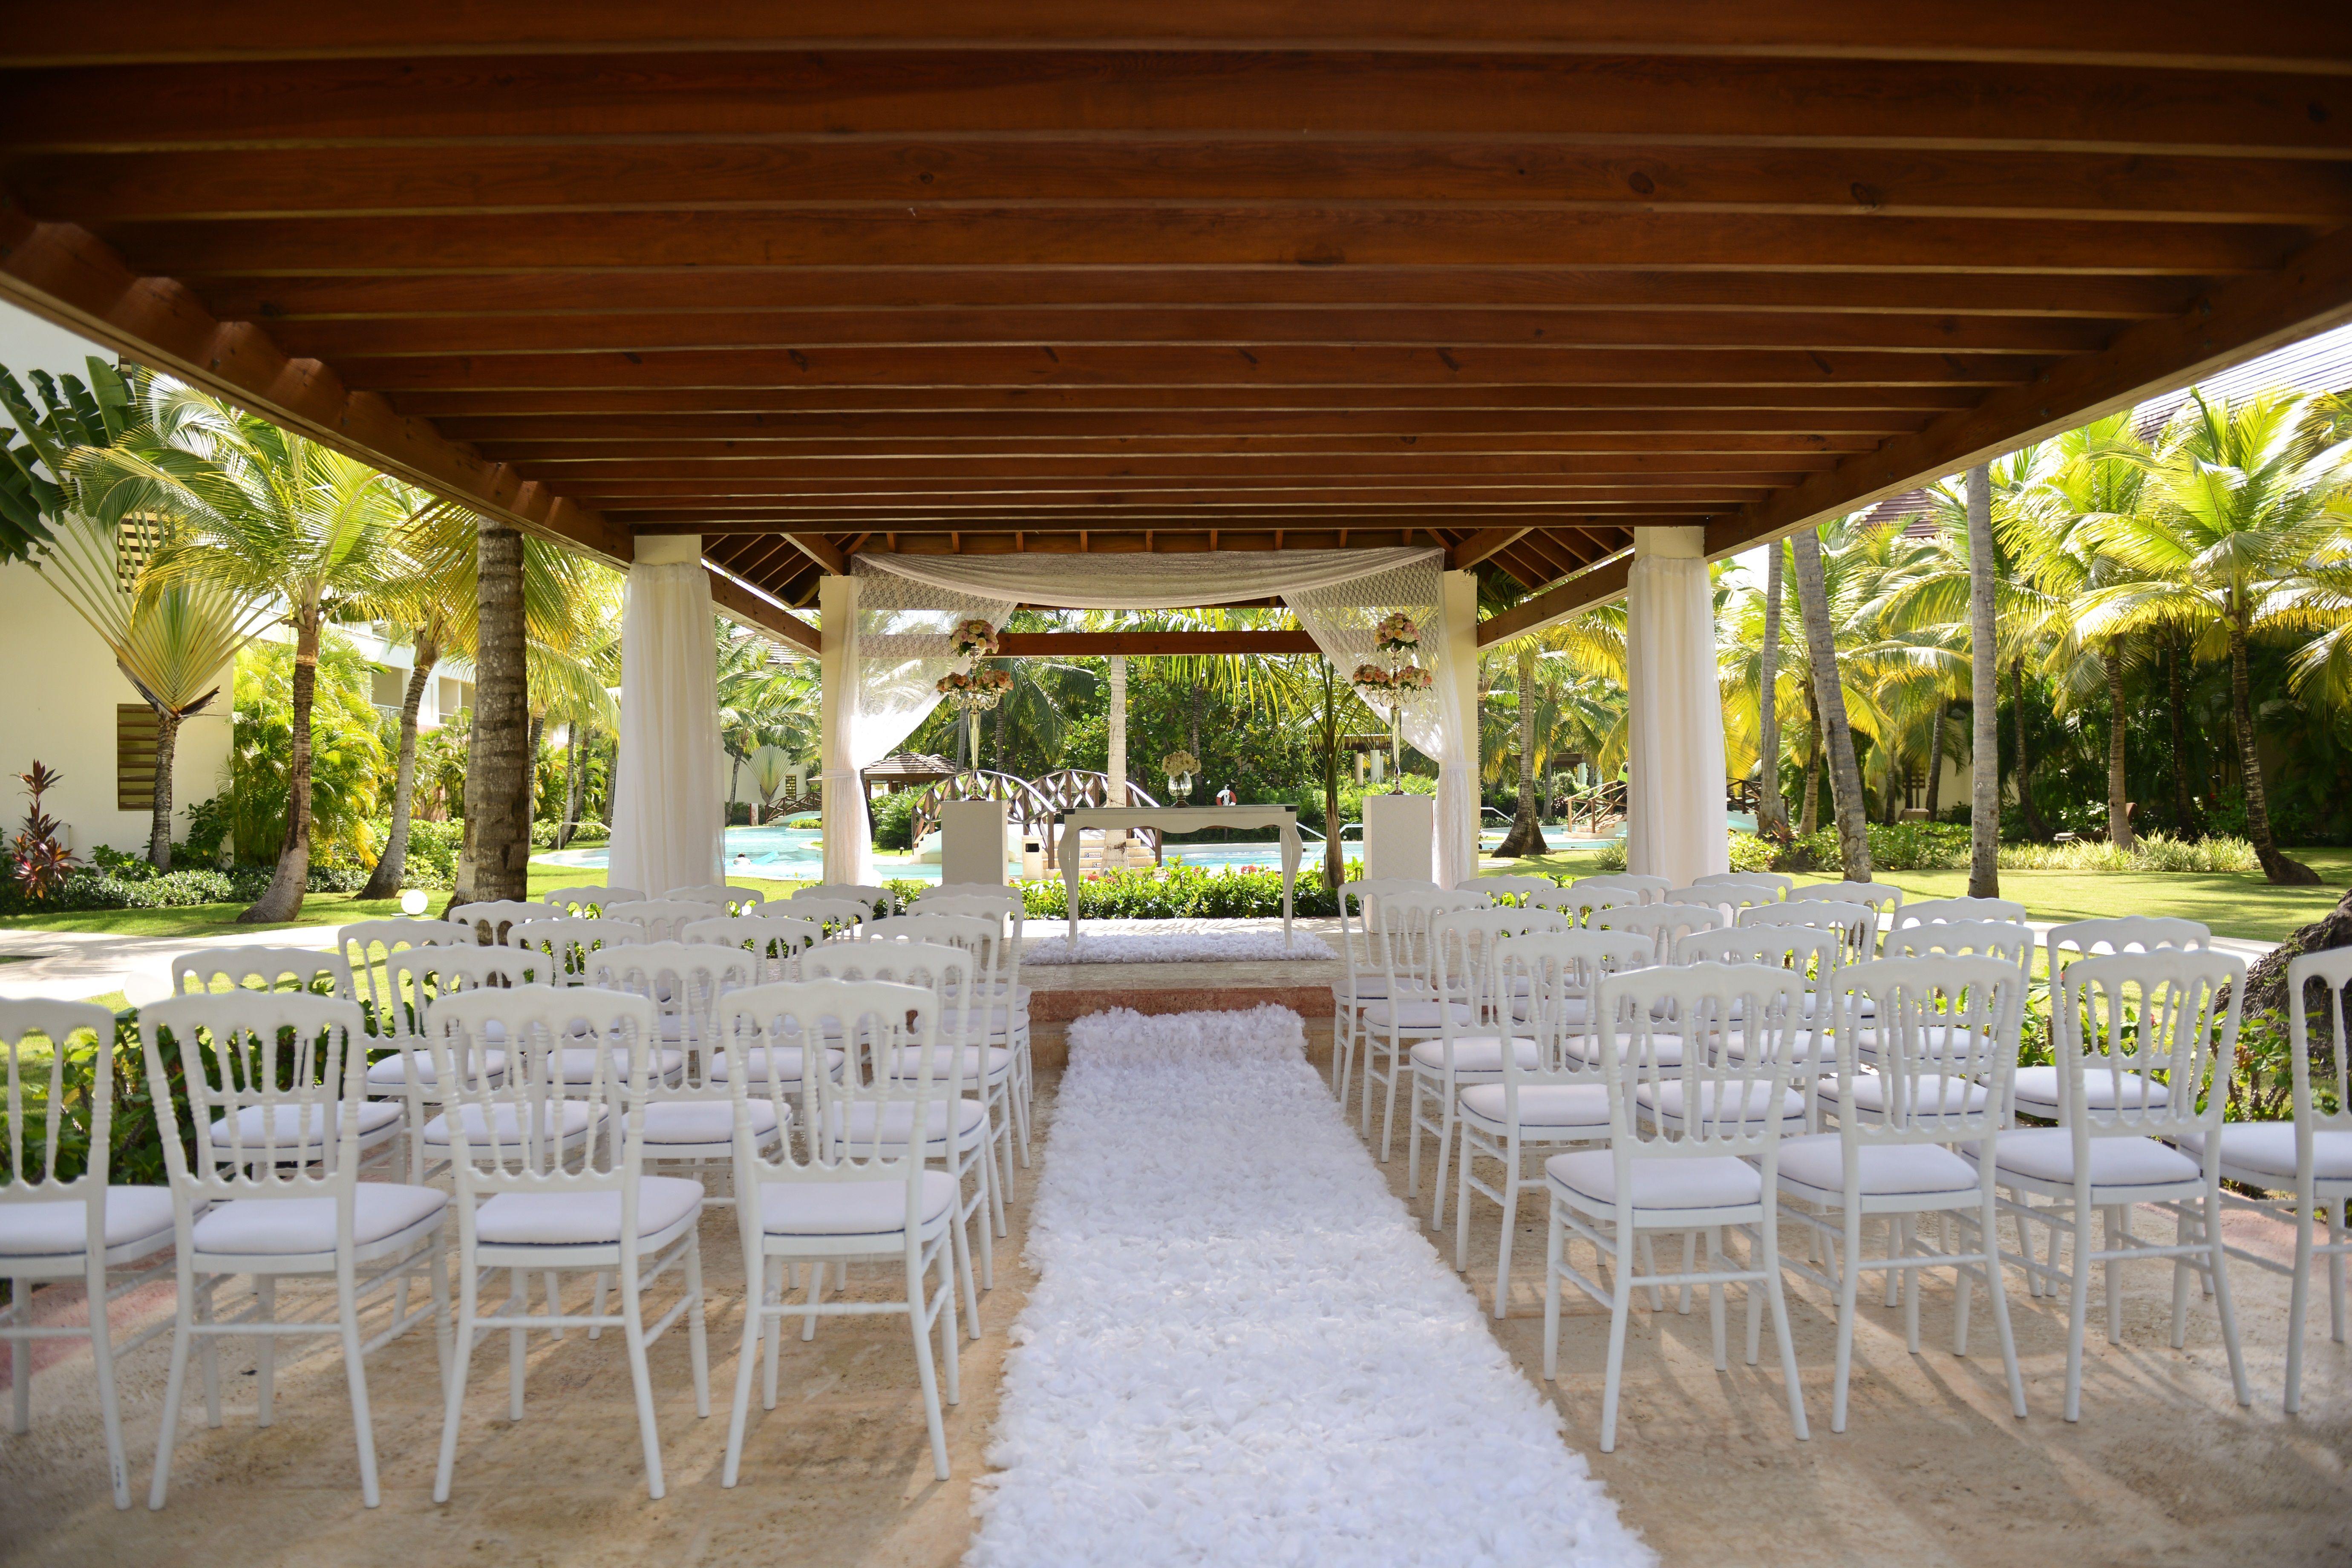 White Ceremony Set Up At The Garden Gazebo Here At Now Larimar Punta Cana Gardenwedding Destinationweddi Now Larimar Punta Cana Now Larimar Punta Cana Beach